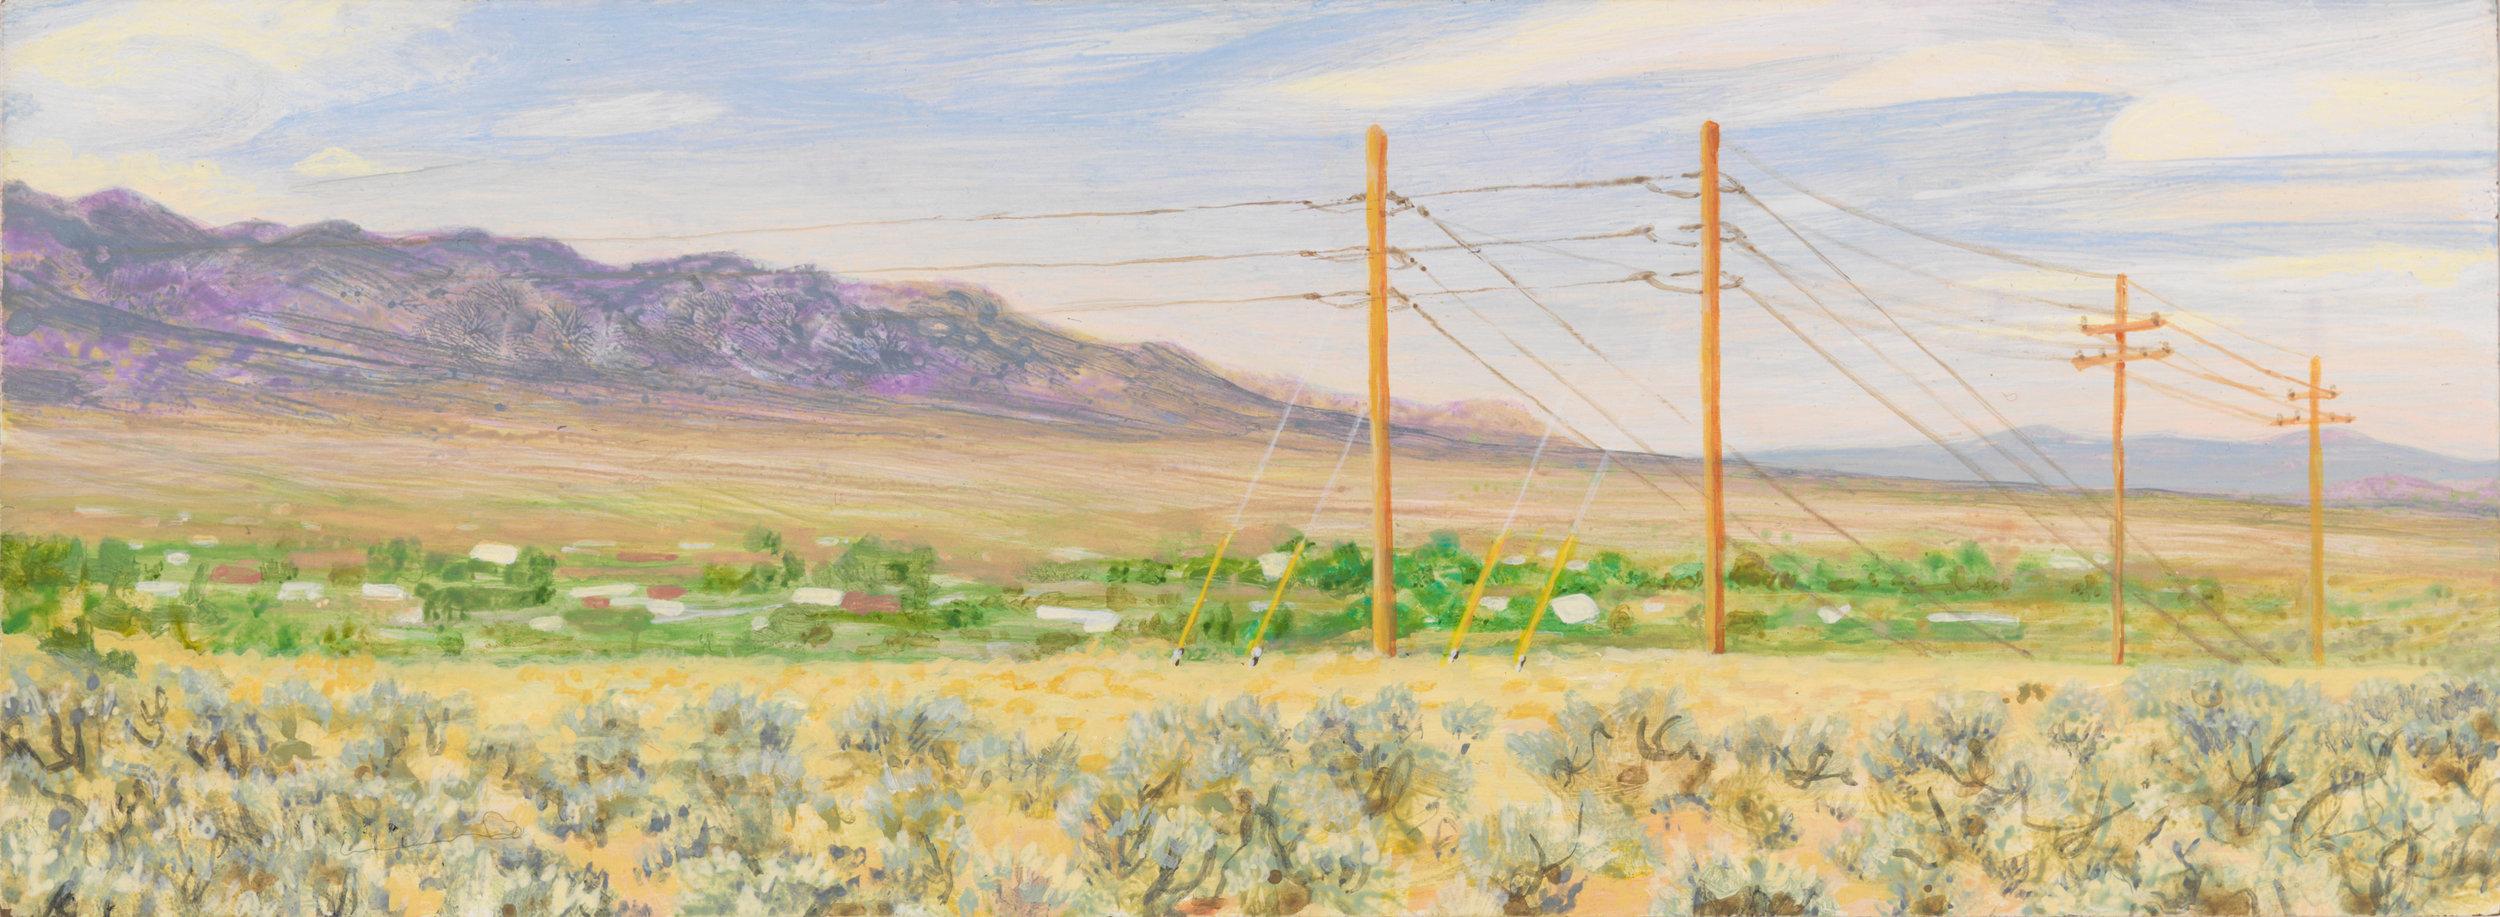 "Taos, 2006, acrylic on panel, 4.5"" x 12"""